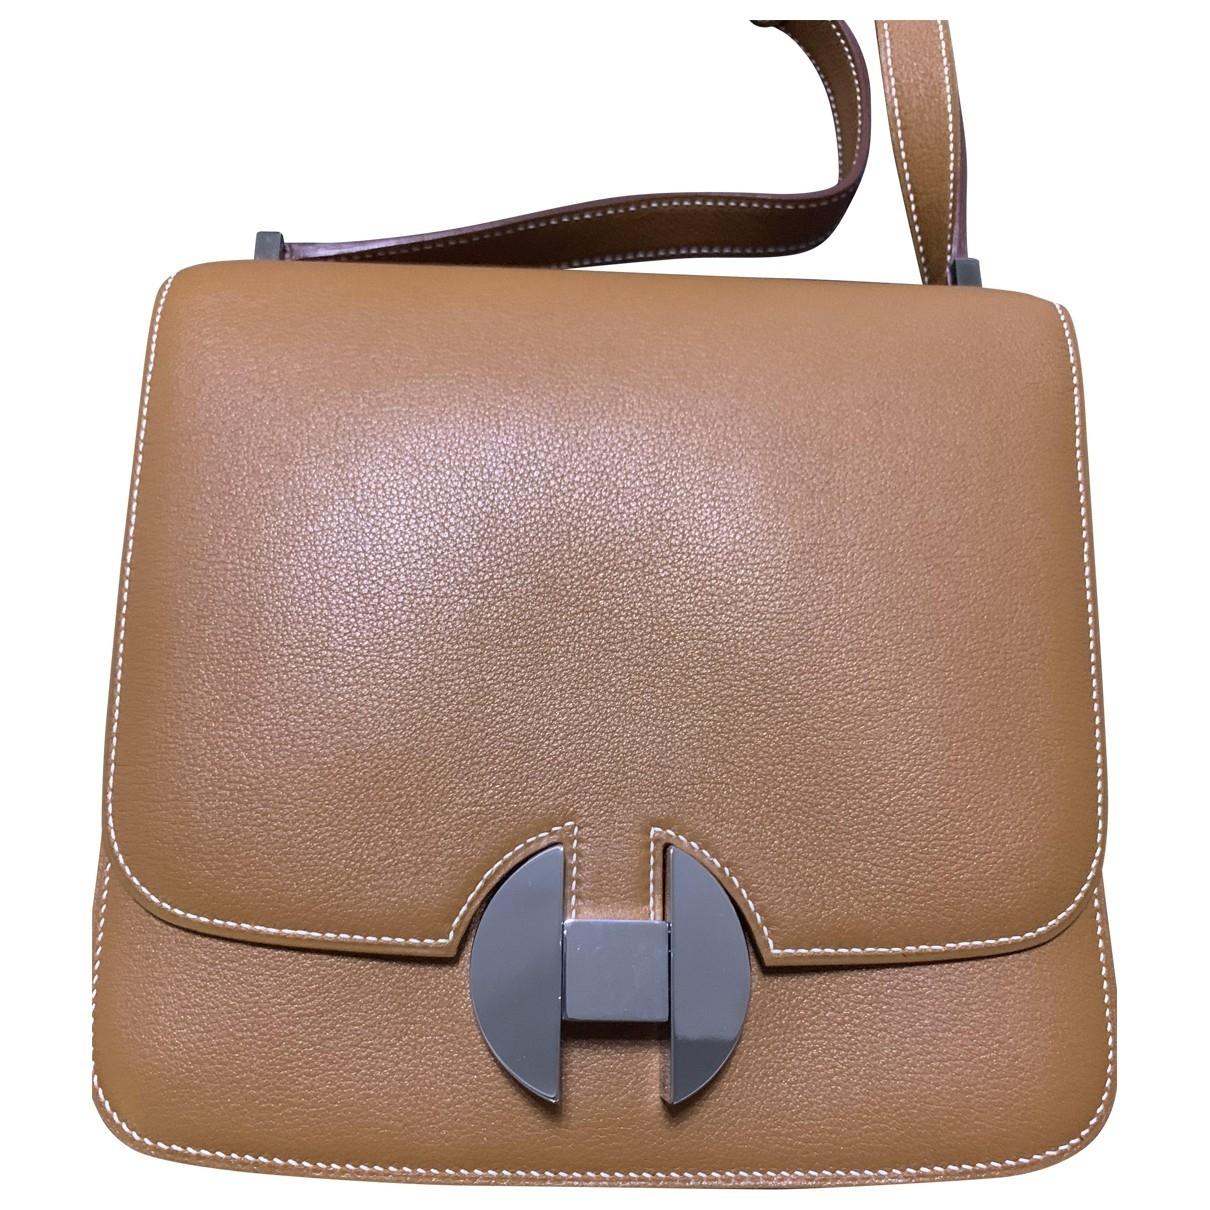 Hermès 2002 Beige Leather handbag for Women \N